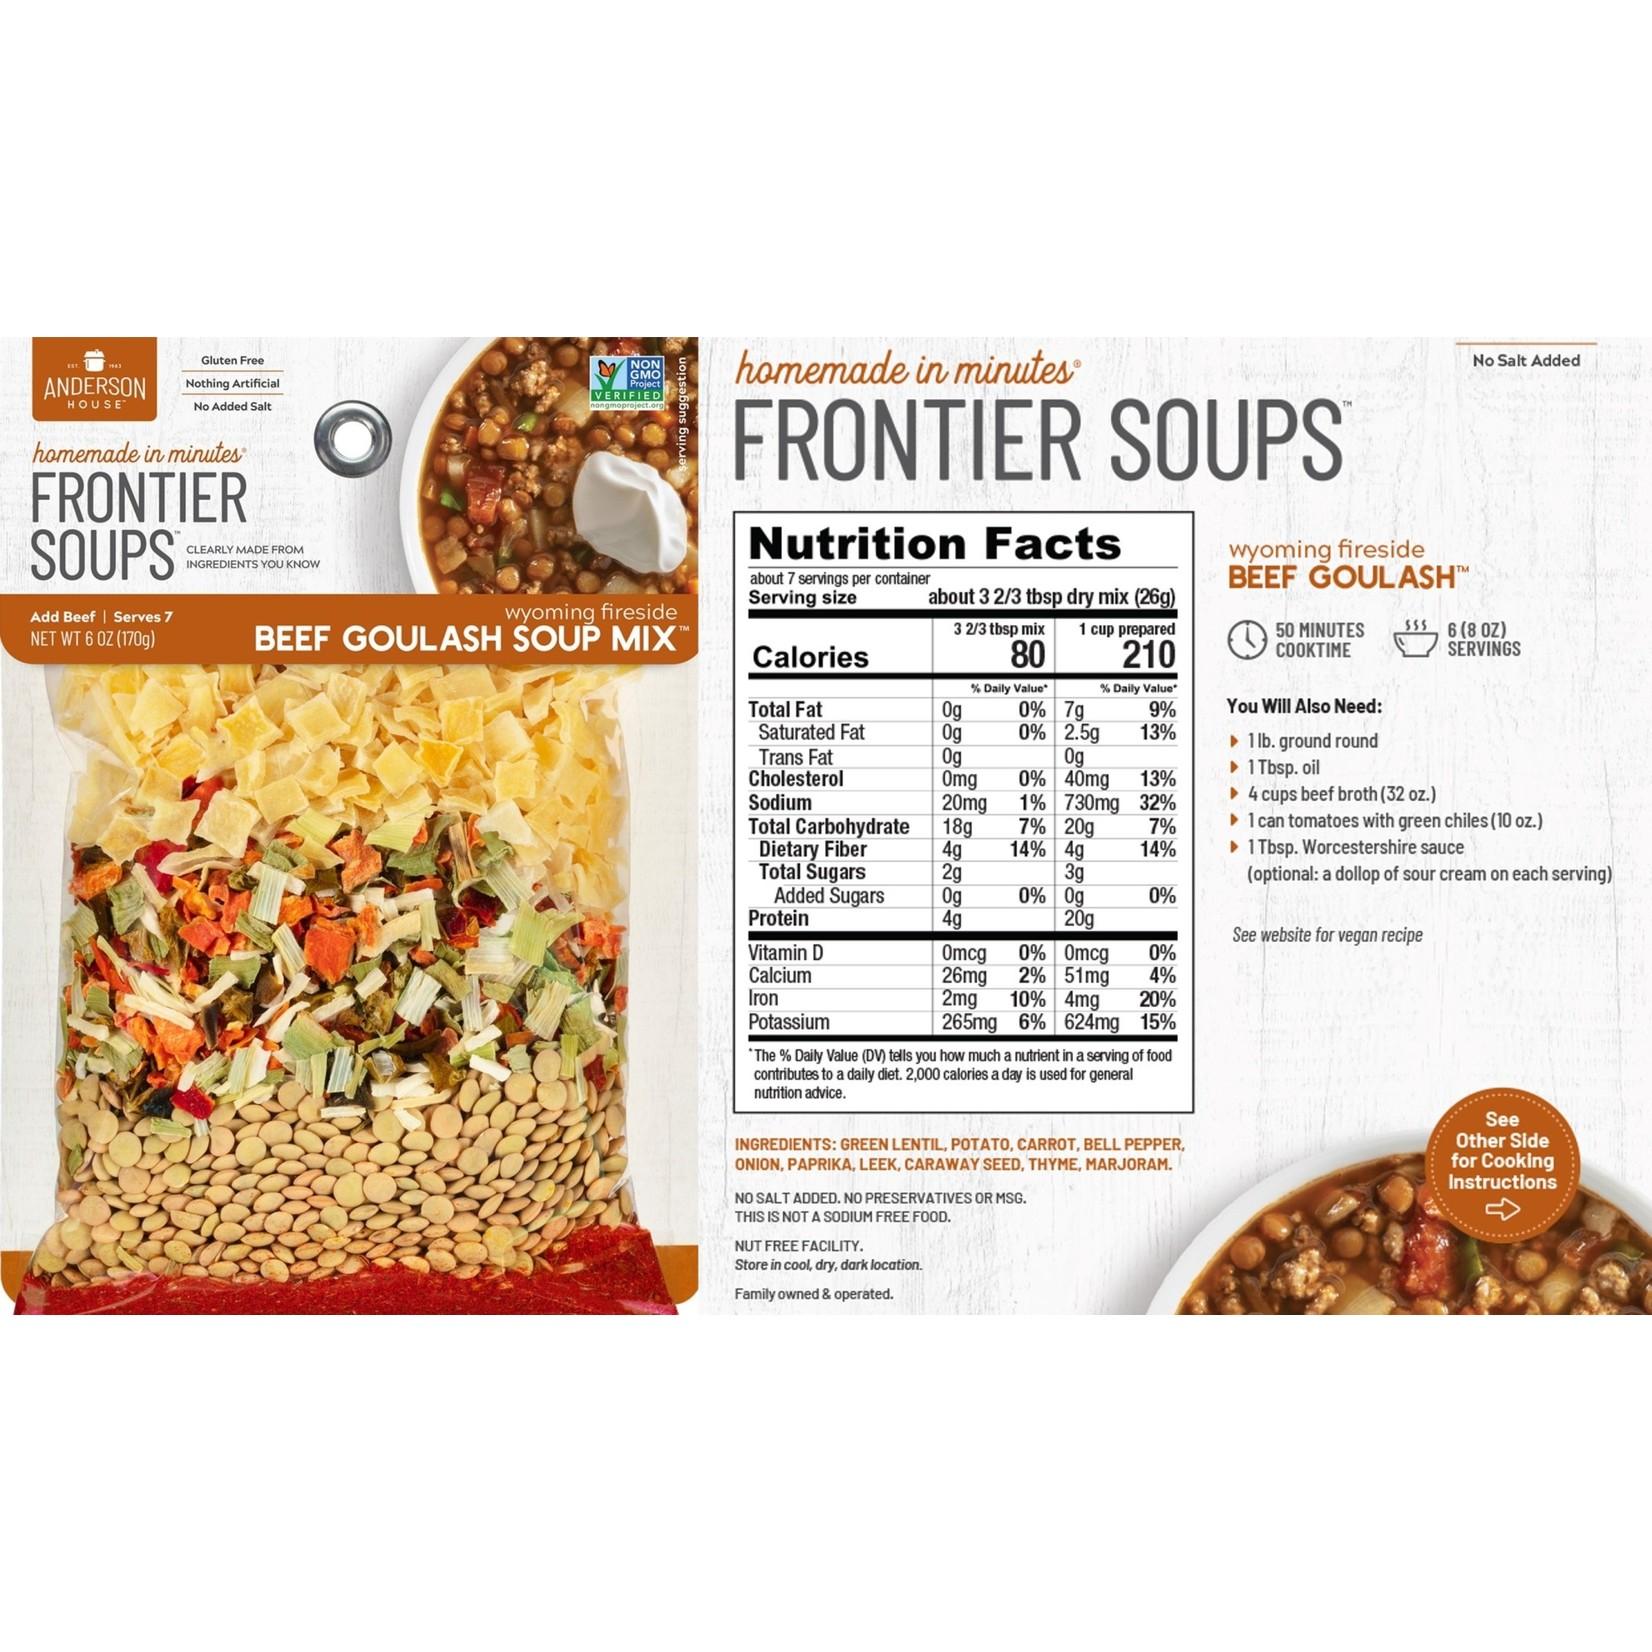 Frontier Soup Frontier Soups -